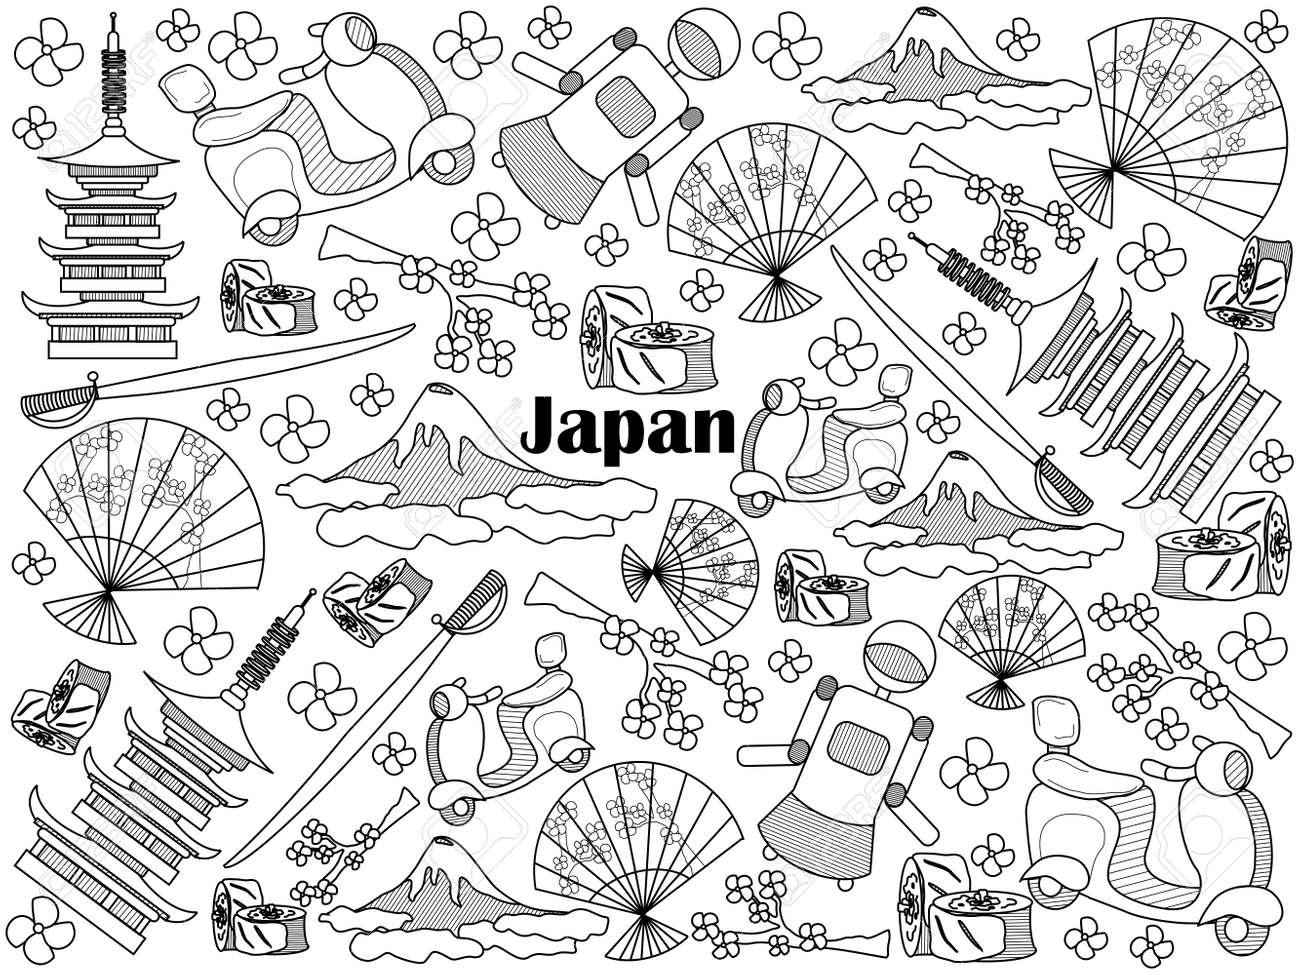 Japan Design Farblos Set Vektor-Illustration. Malbuch. Schwarz-Weiß ...